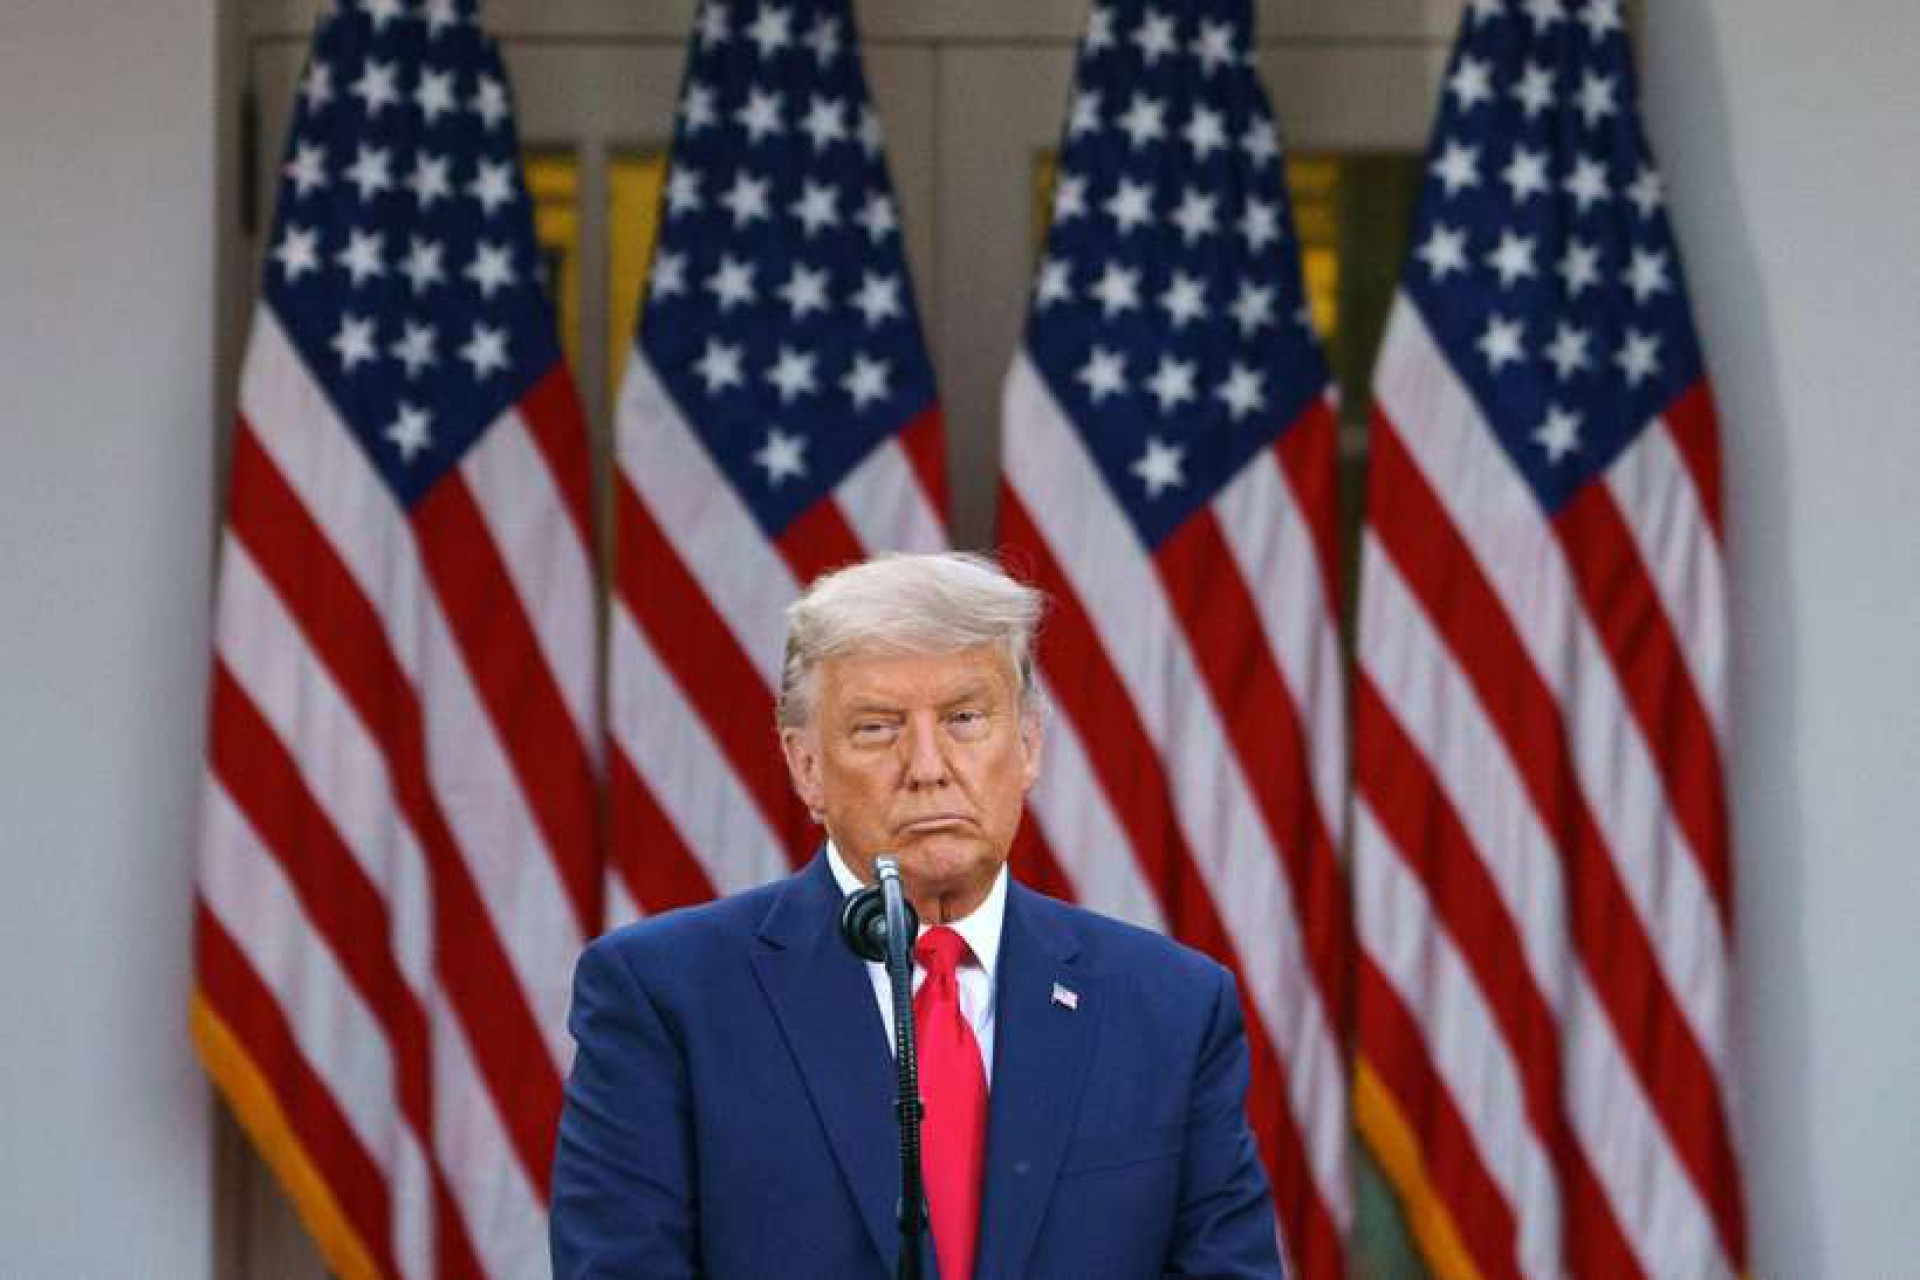 Trump comenta luta de Victor Belfort e aproveita para criticar Biden